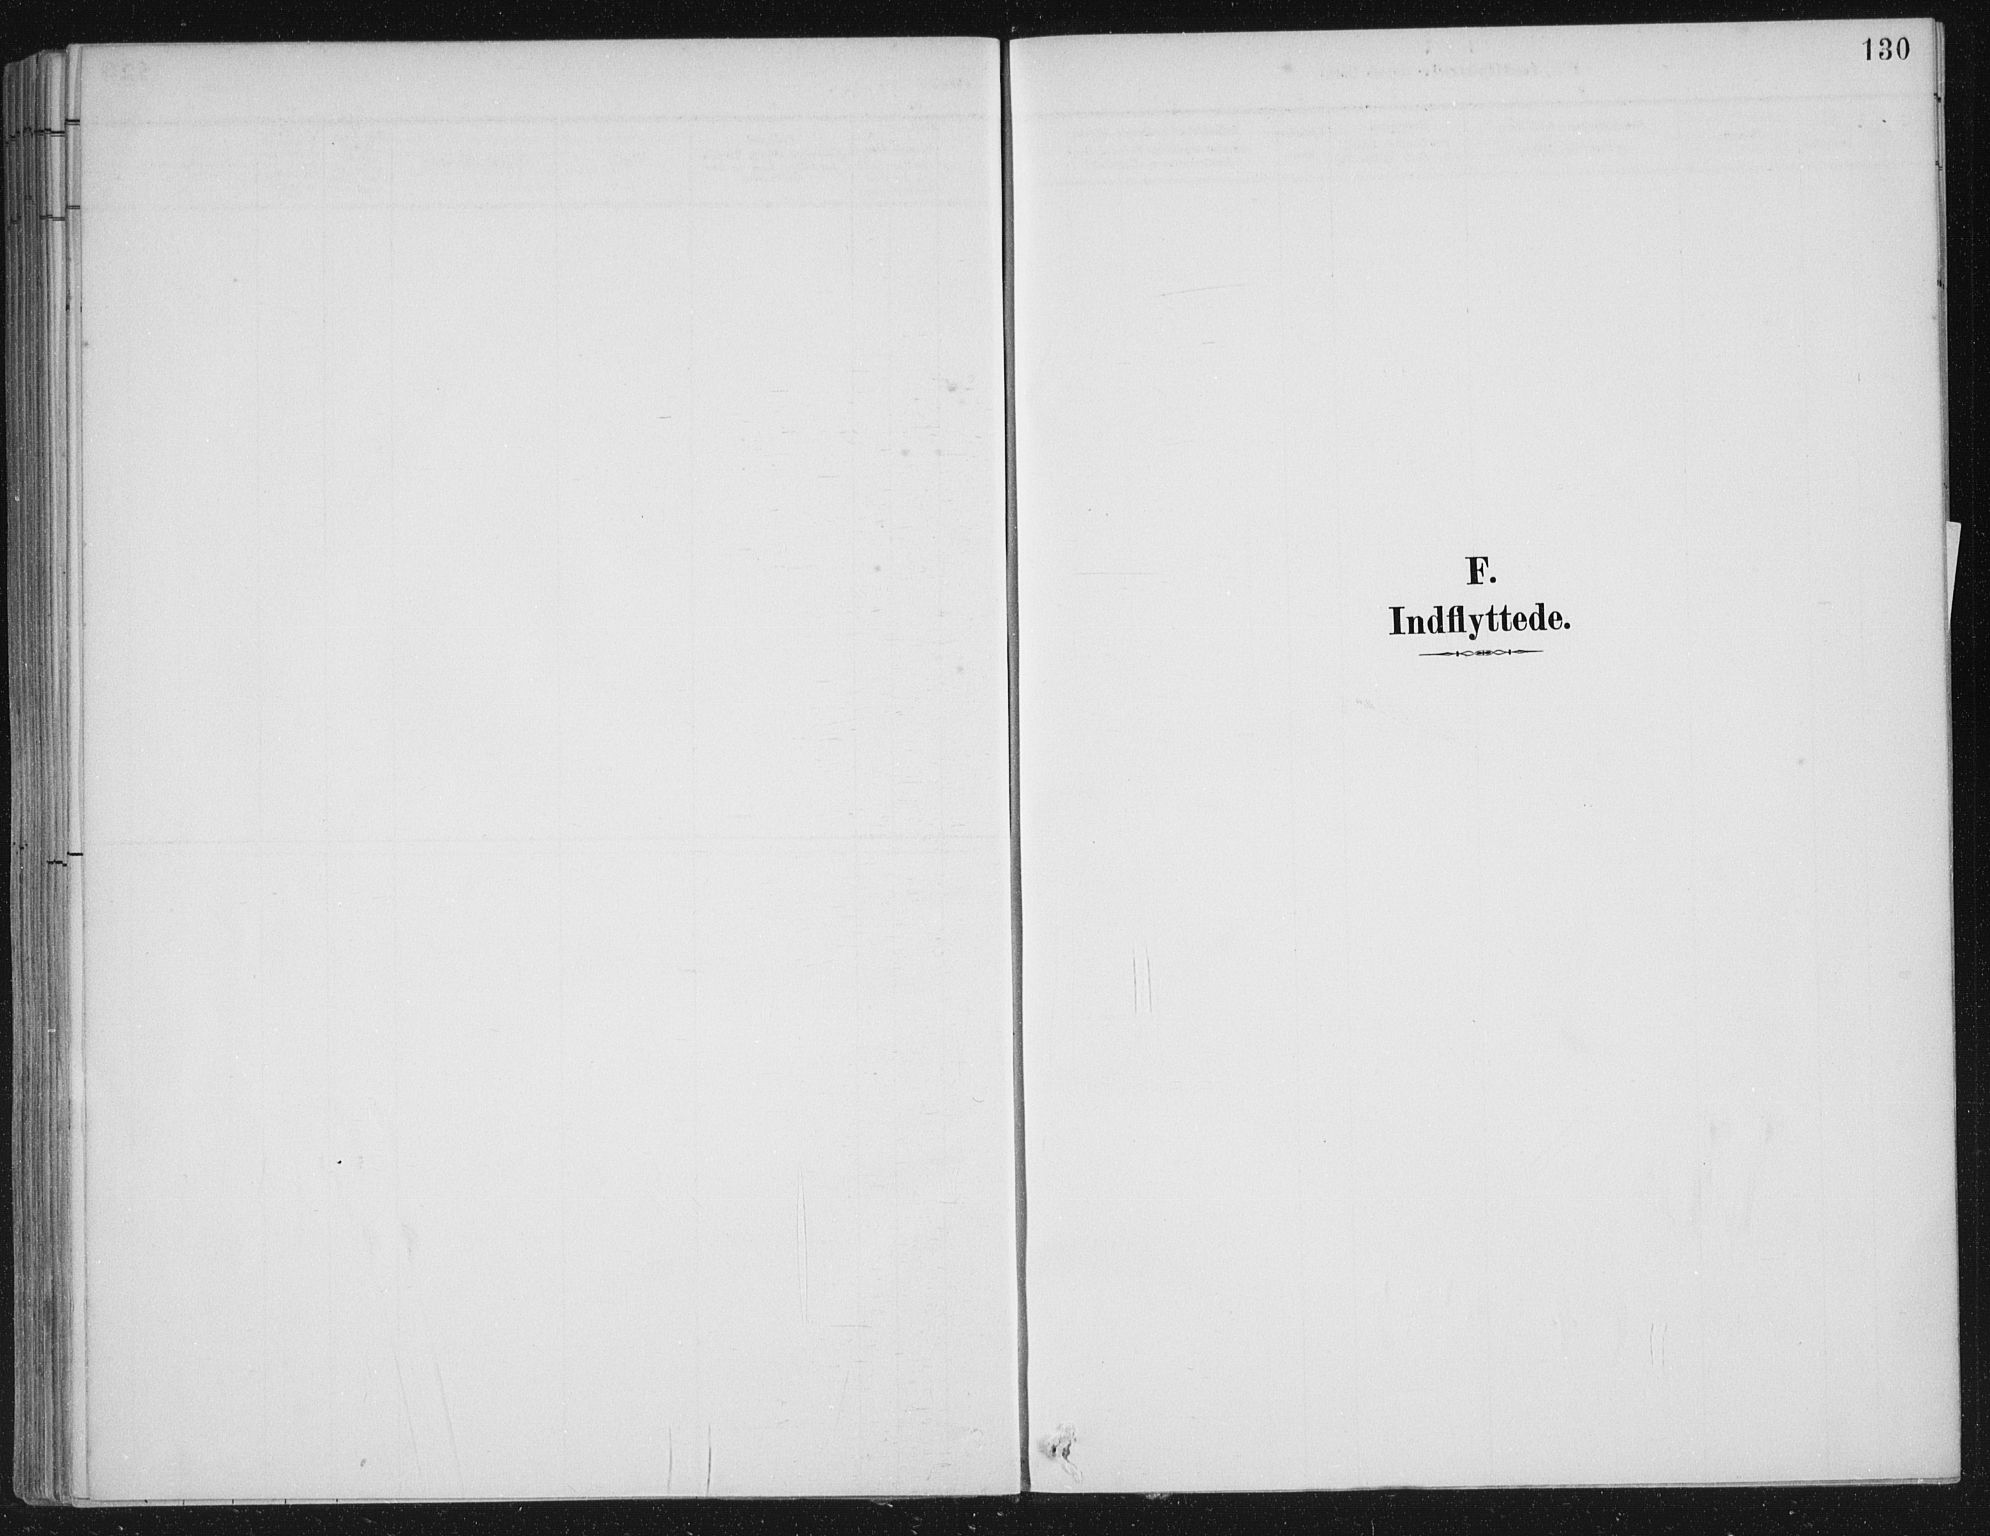 SAB, Kinn sokneprestembete, H/Haa/Haae/L0001: Ministerialbok nr. E 1, 1890-1916, s. 130